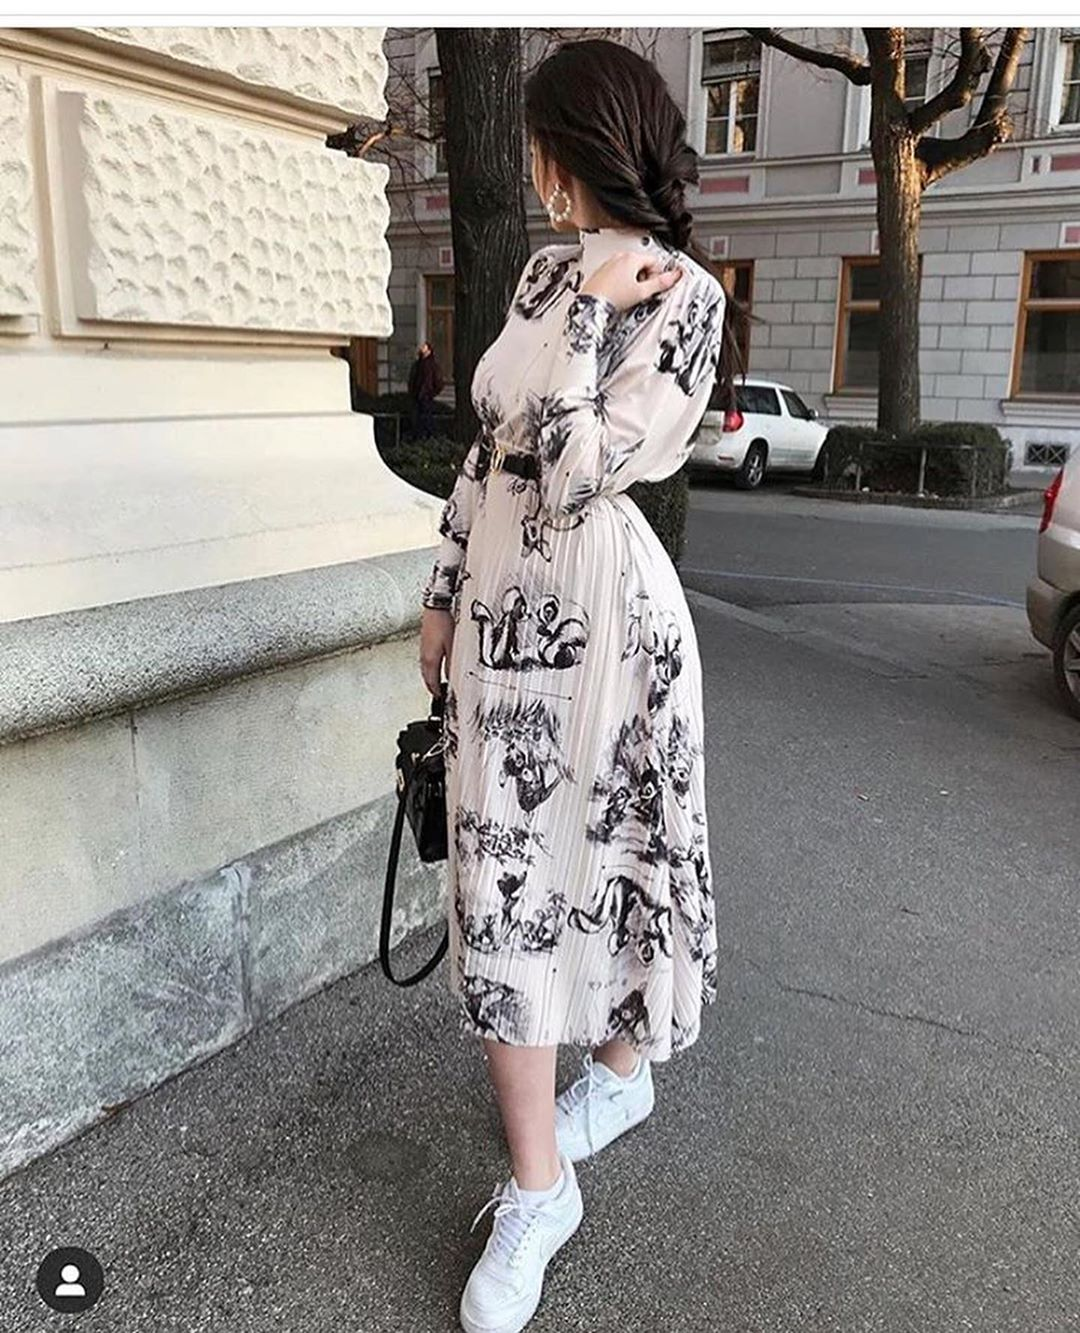 dress bambi disney stories collection de Zara sur look_by_zara_hm